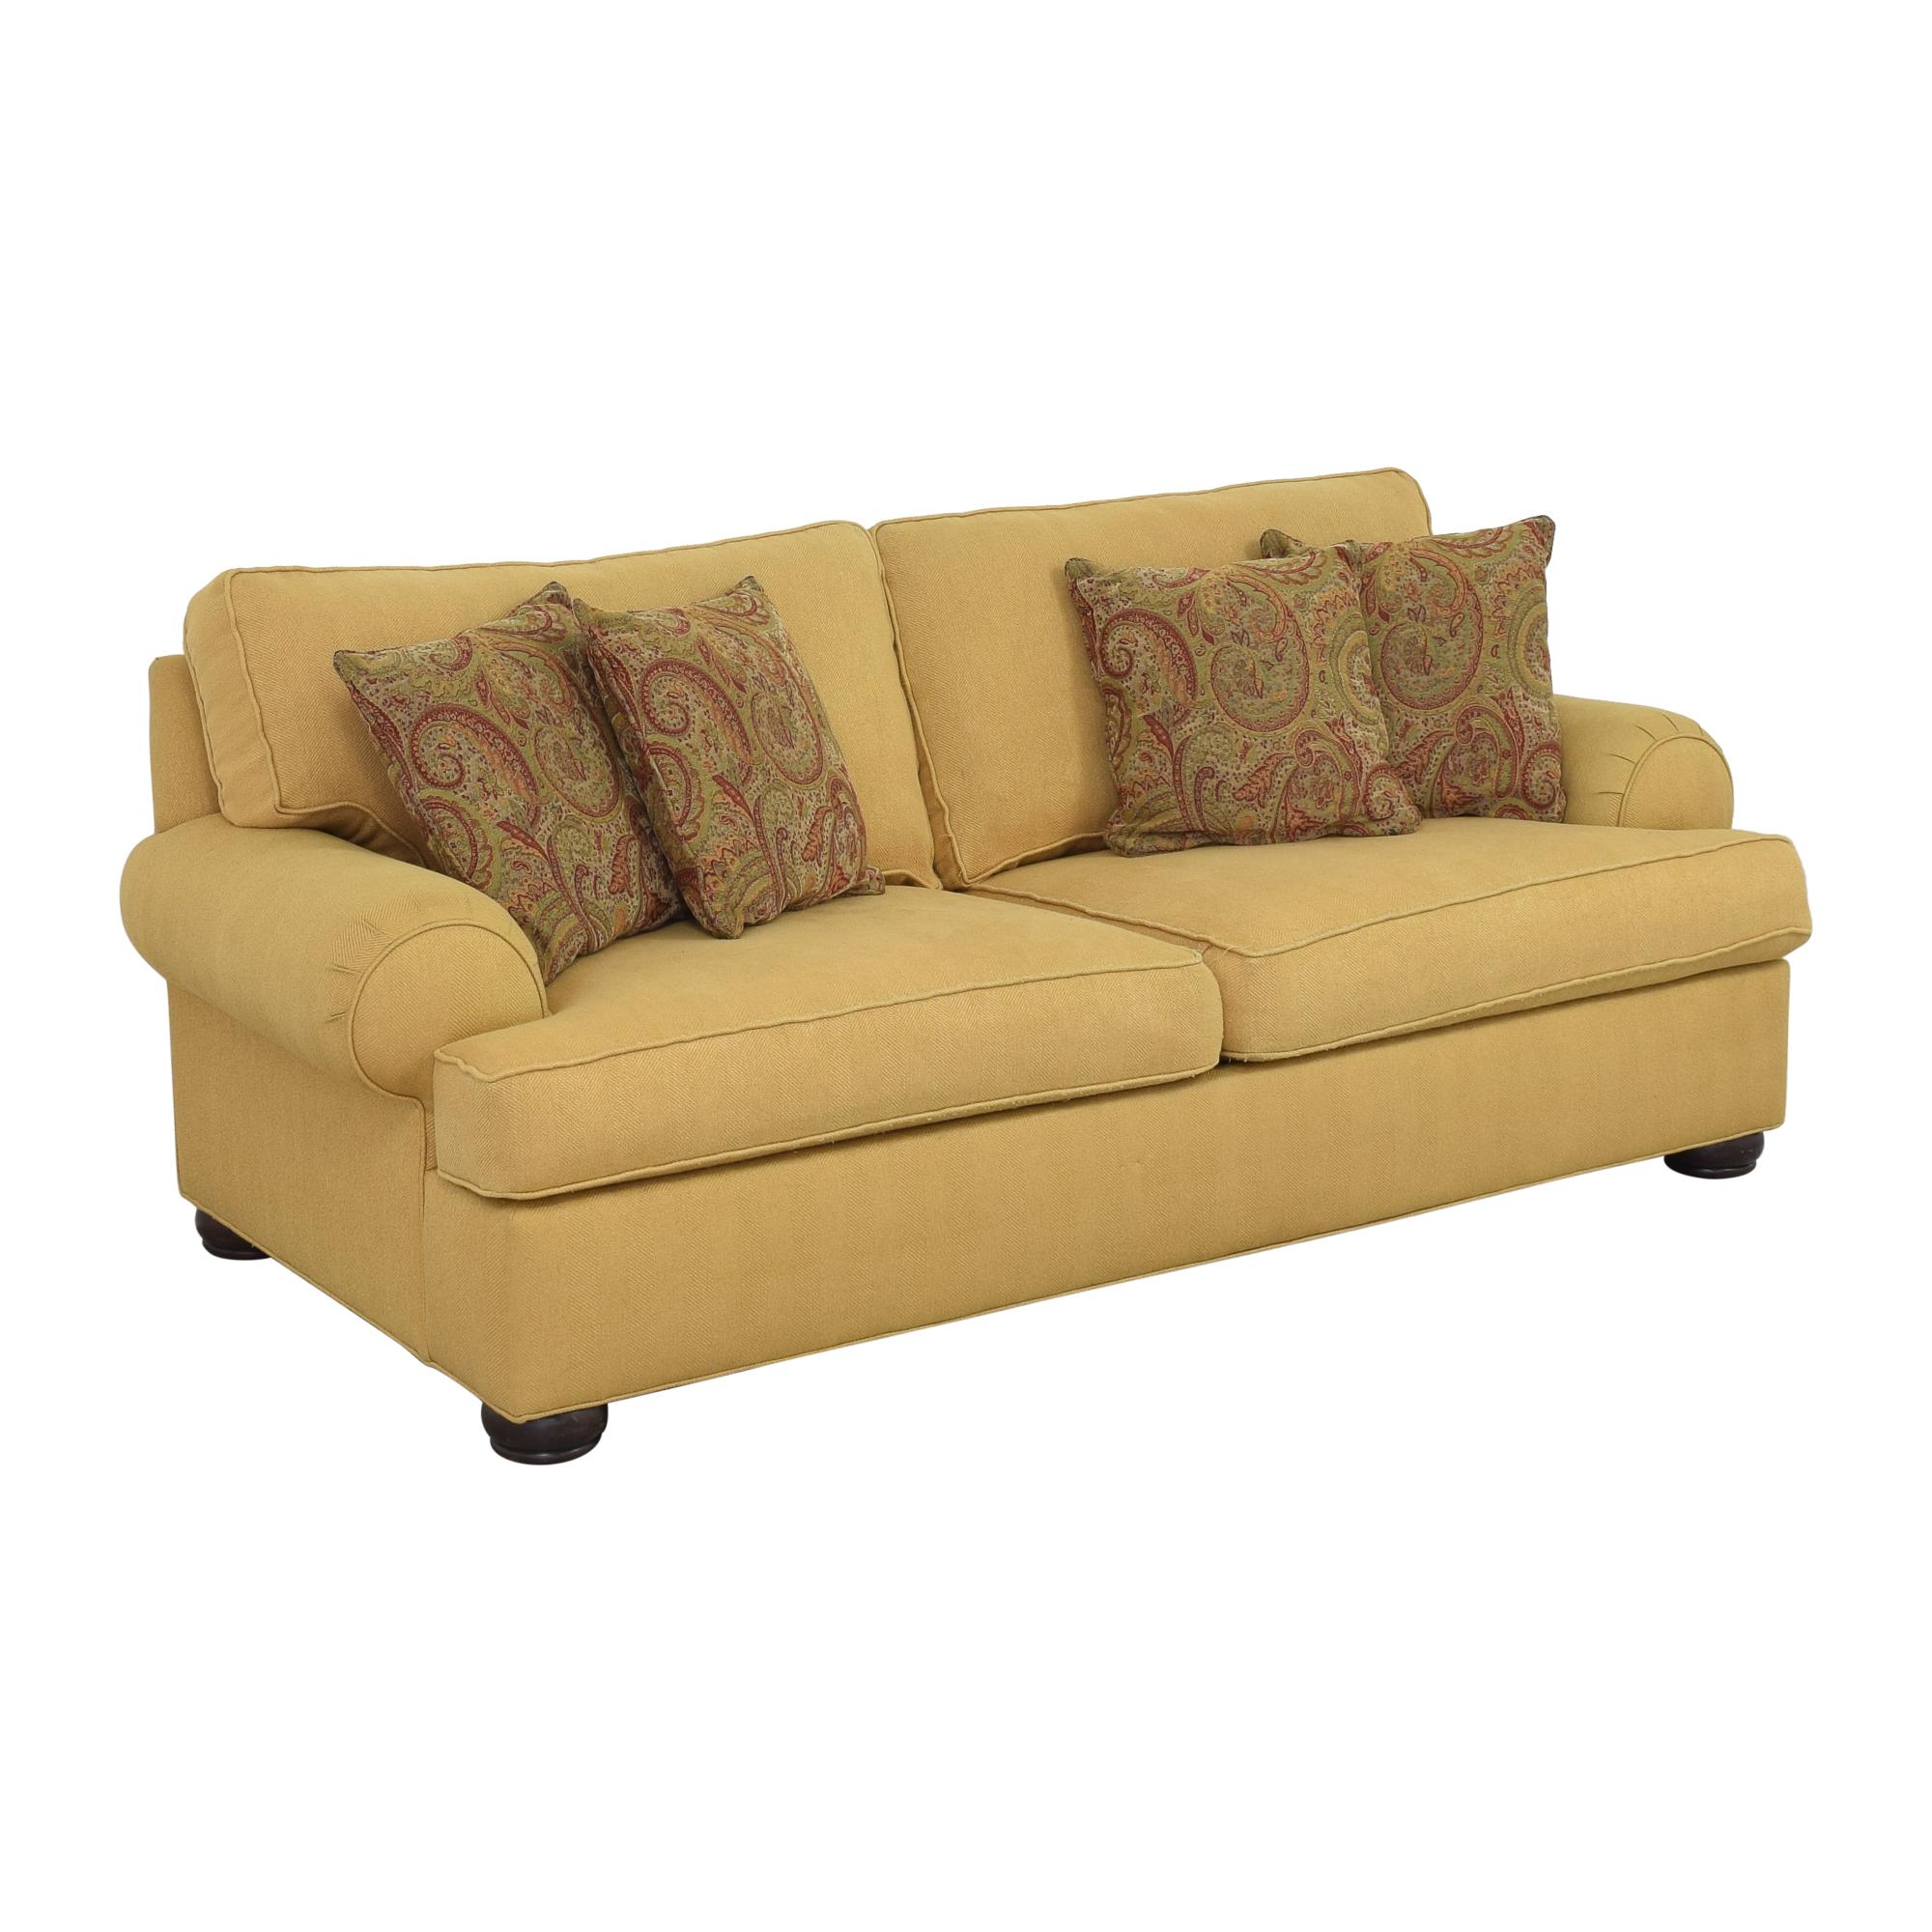 buy Ethan Allen Roll Arm Sofa Ethan Allen Classic Sofas